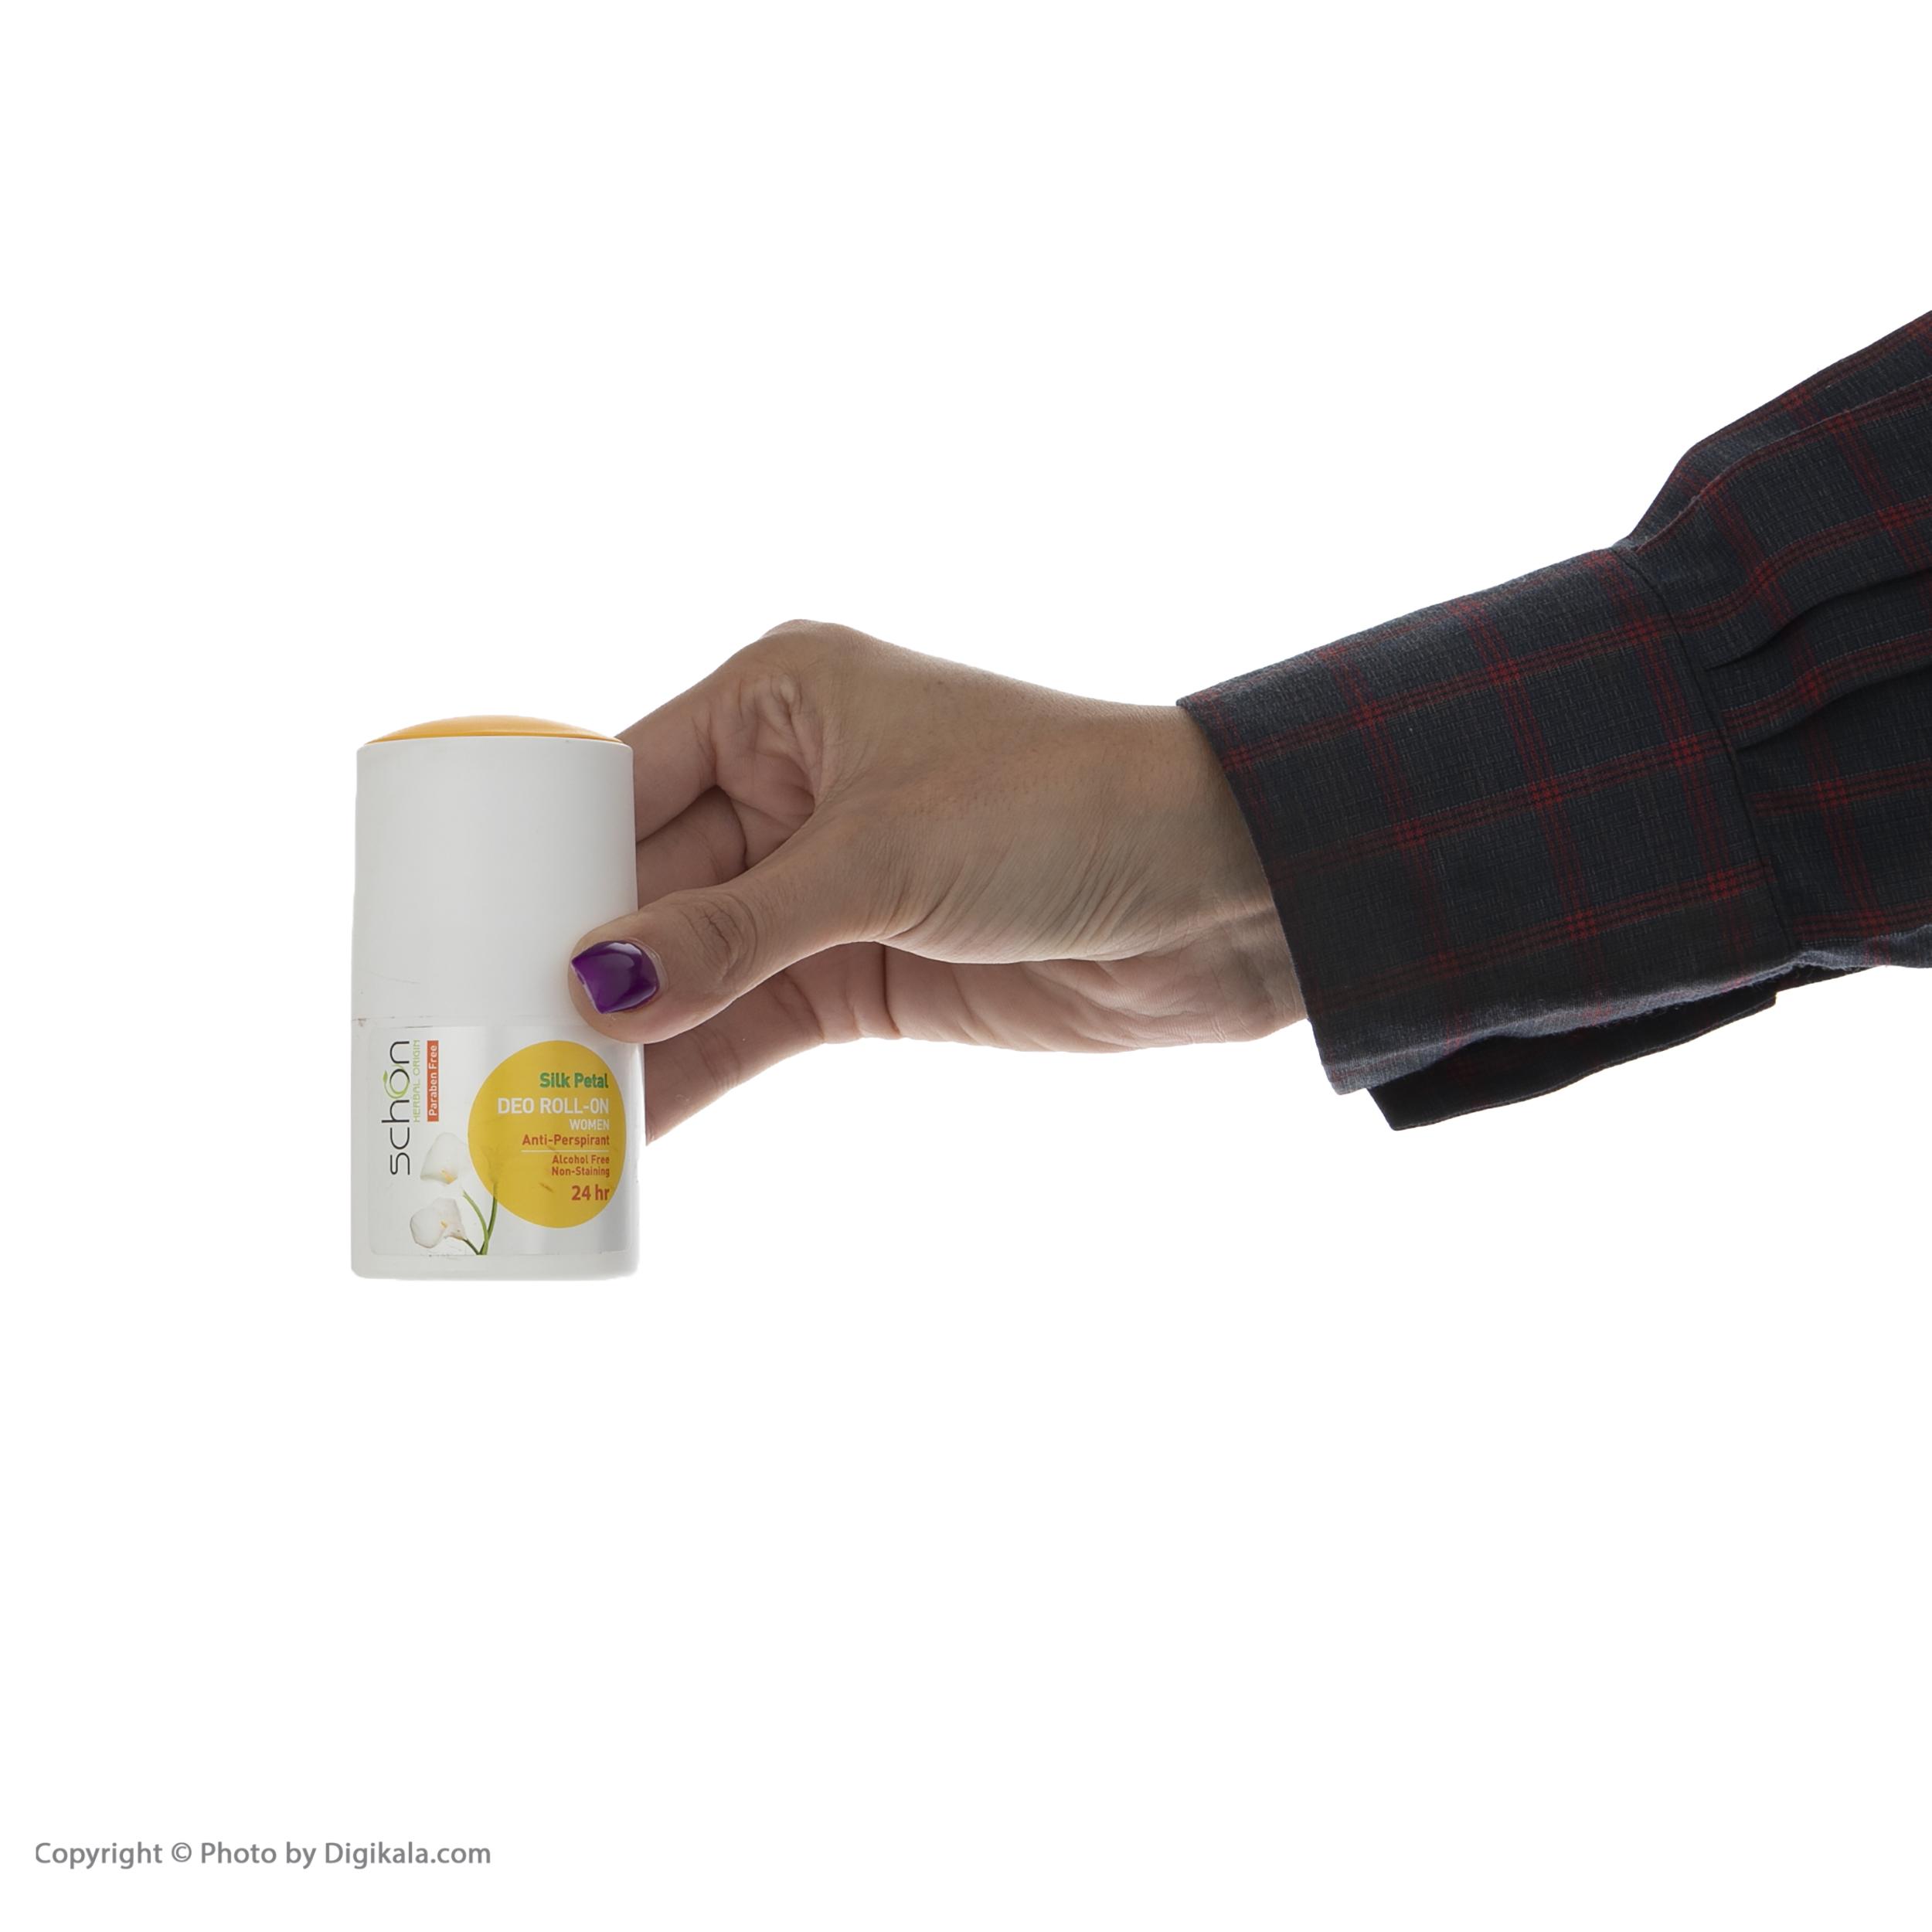 رول ضد تعریق زنانه شون مدل Silk Petal حجم 50 میلی لیتر main 1 1